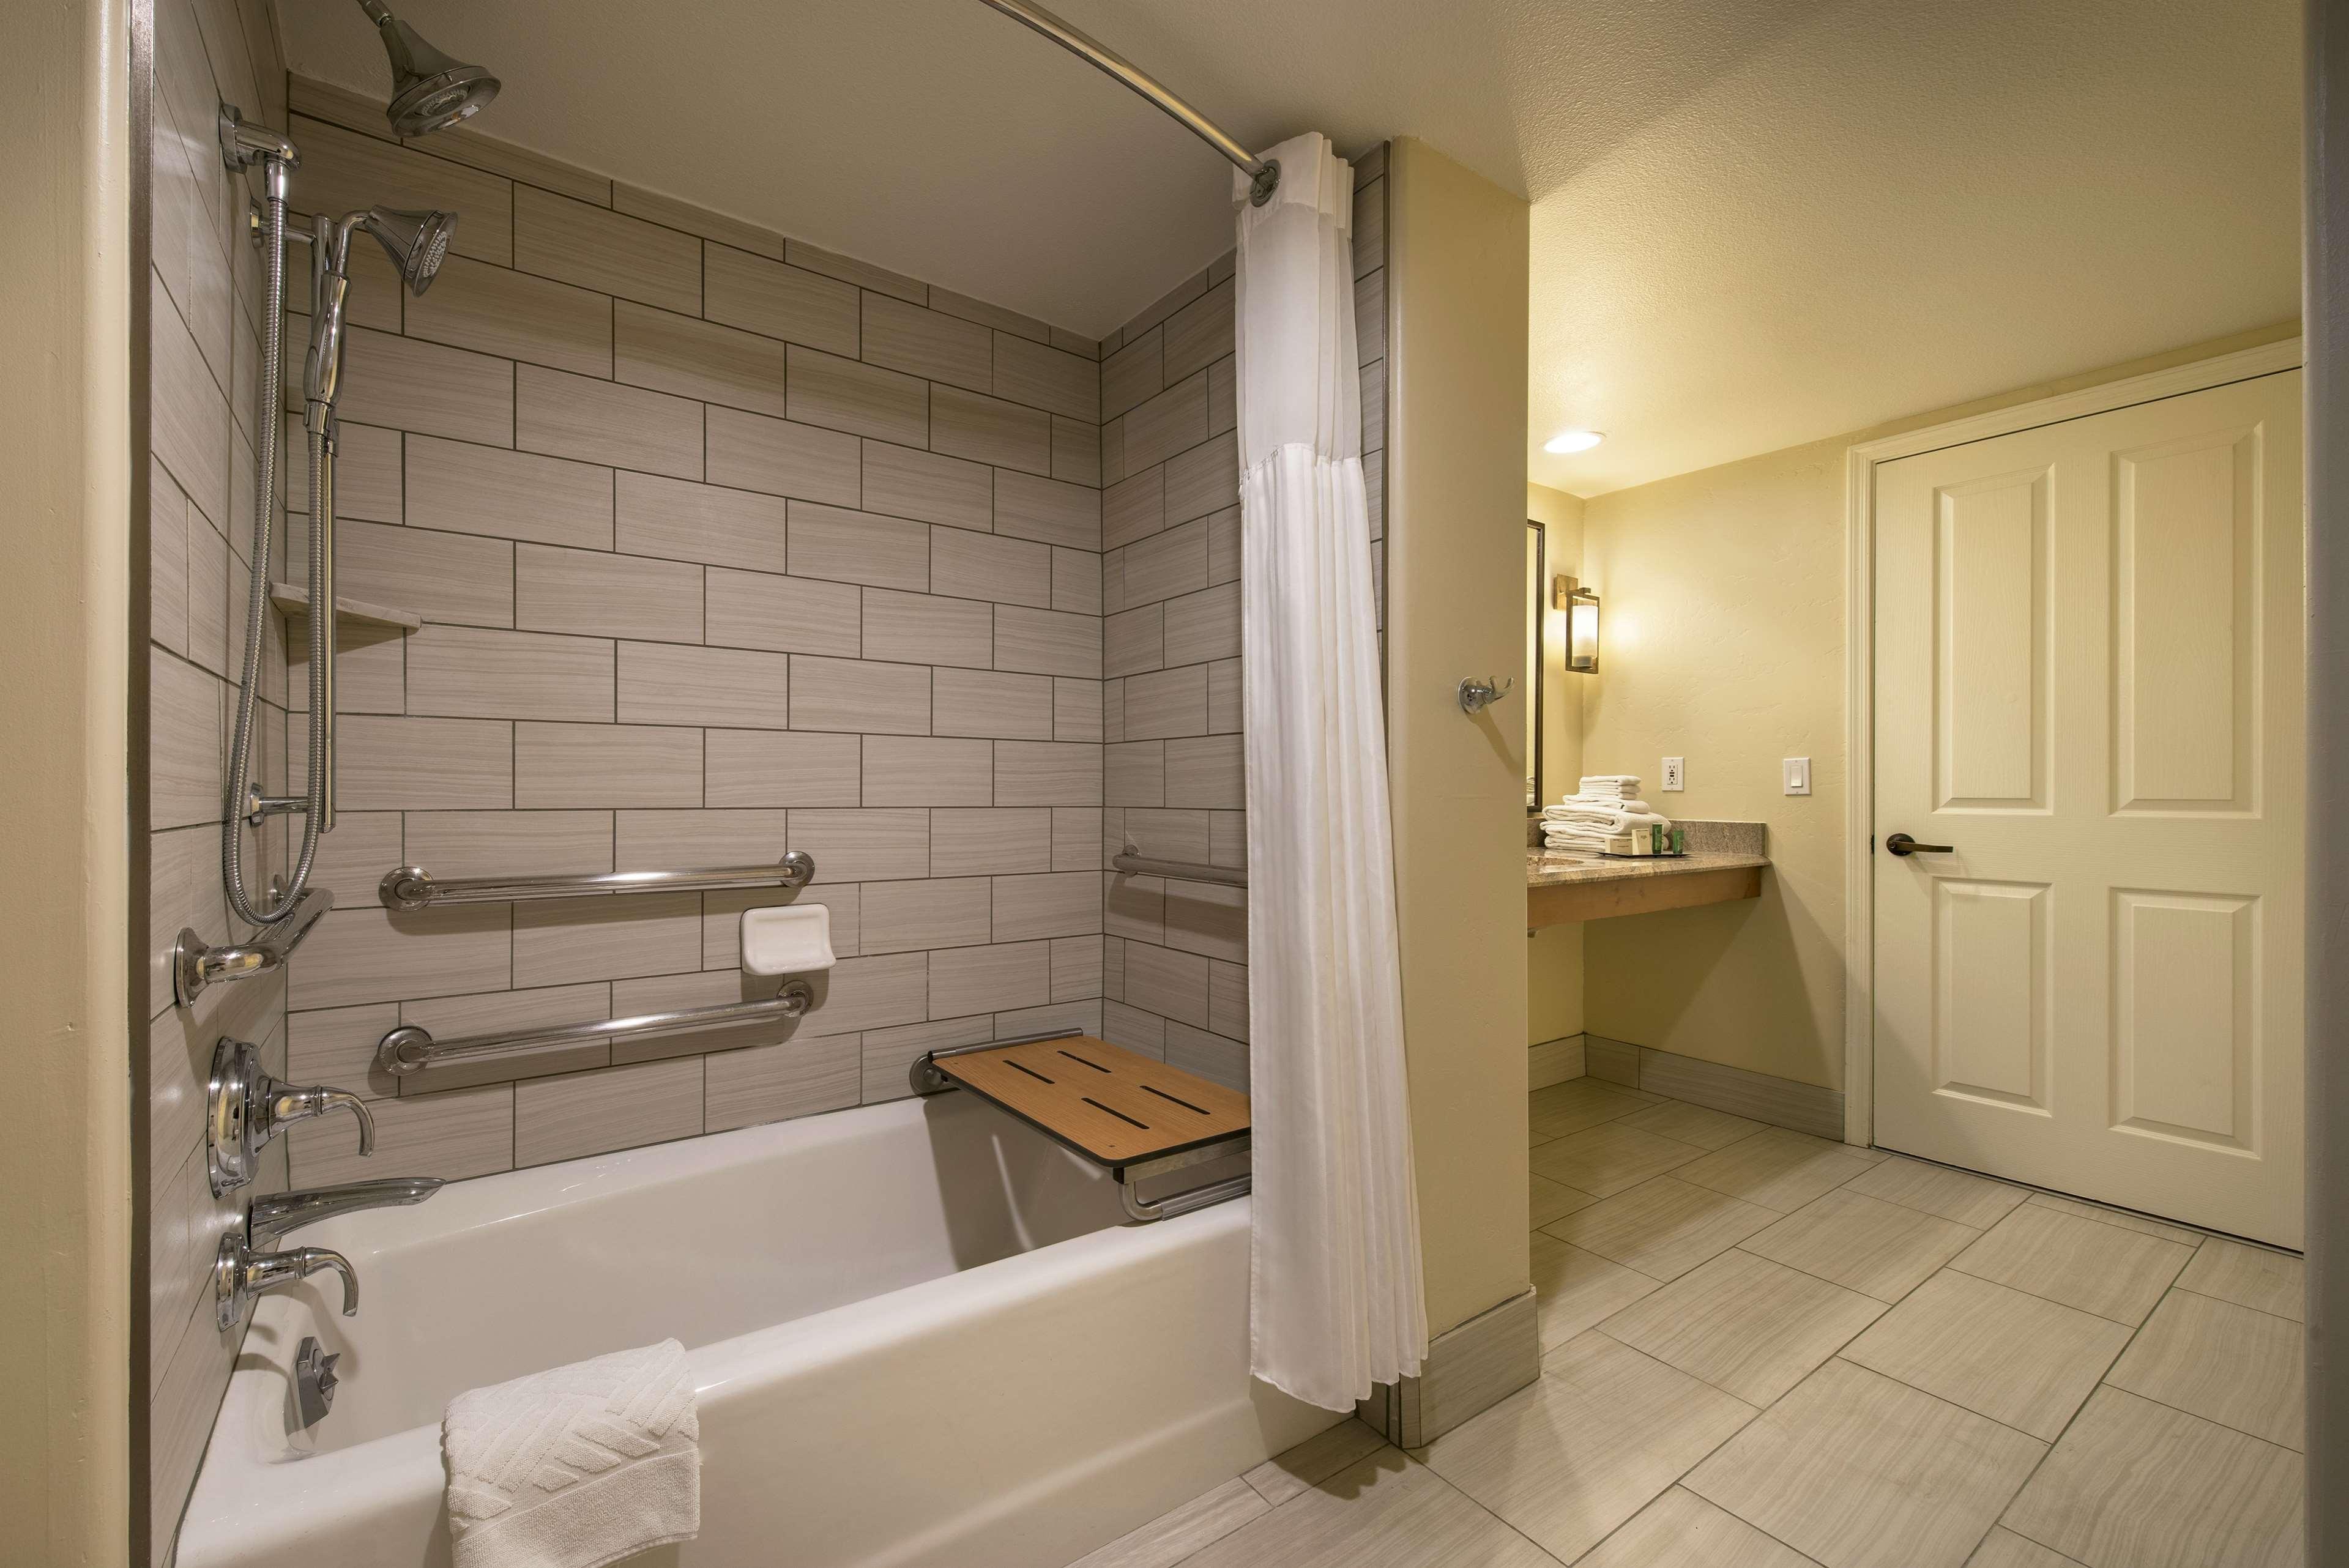 Hilton Sedona Resort at Bell Rock image 43